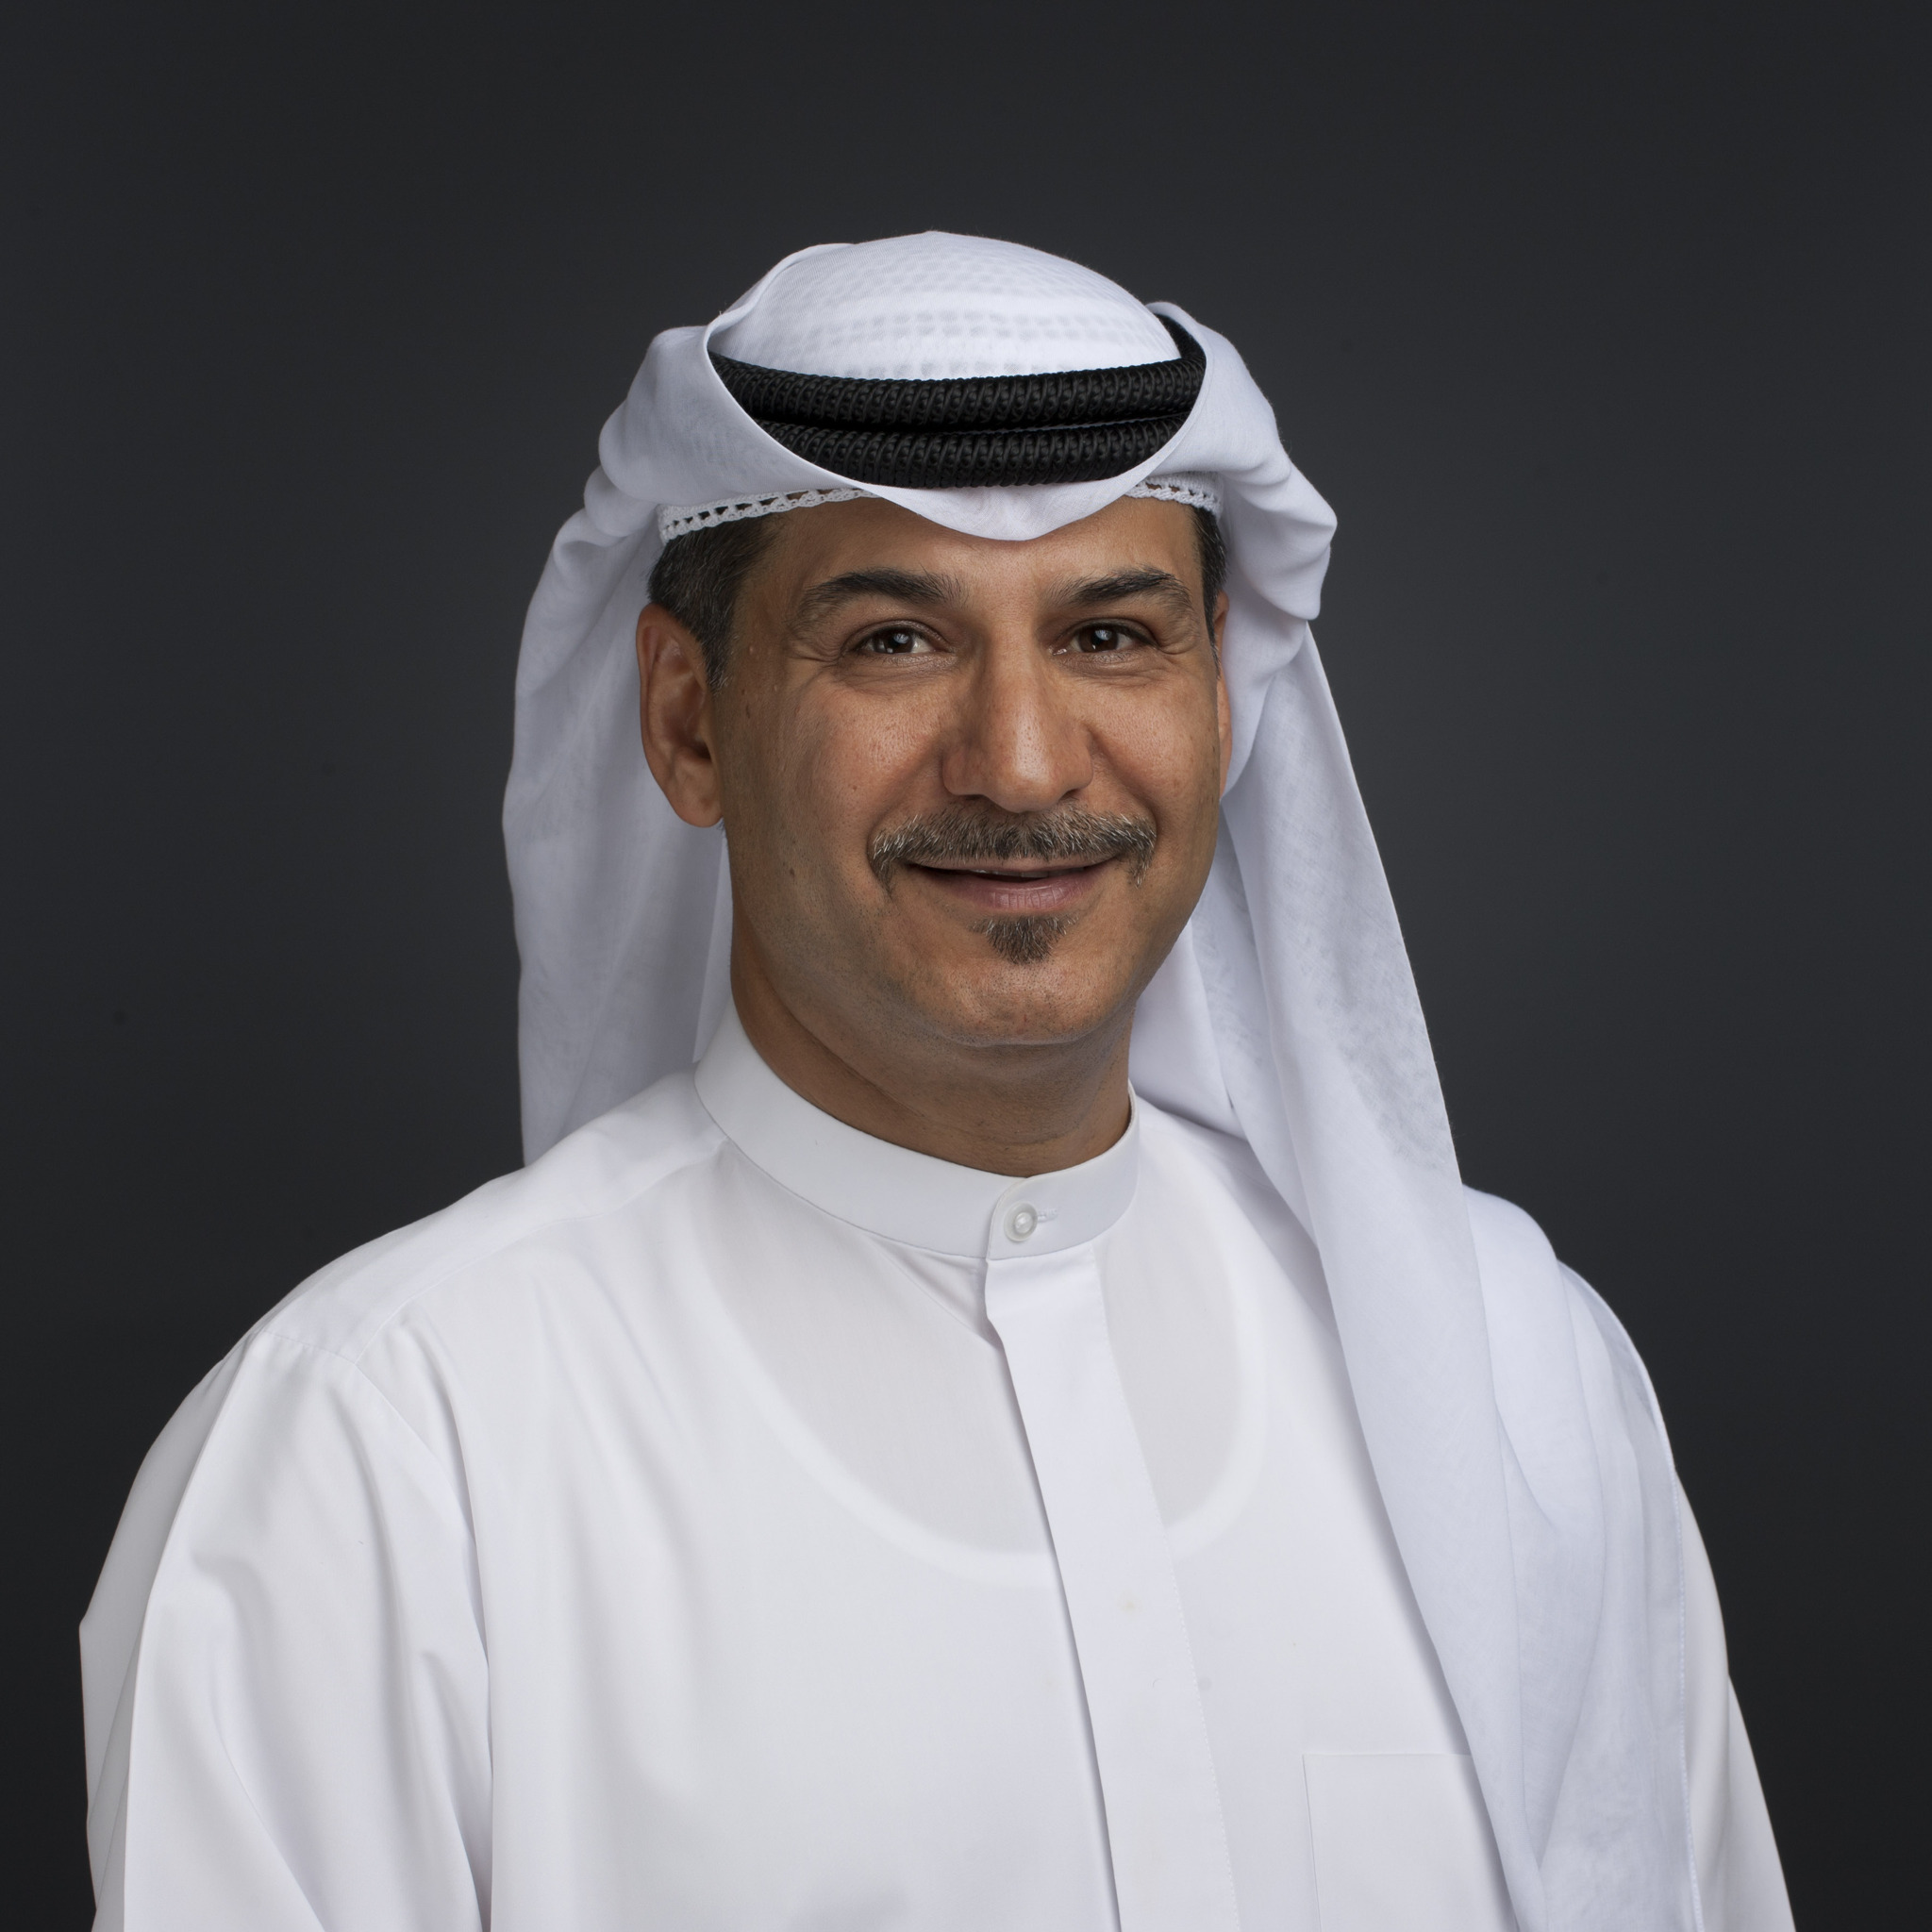 emirates senior vice president - HD2048×2048